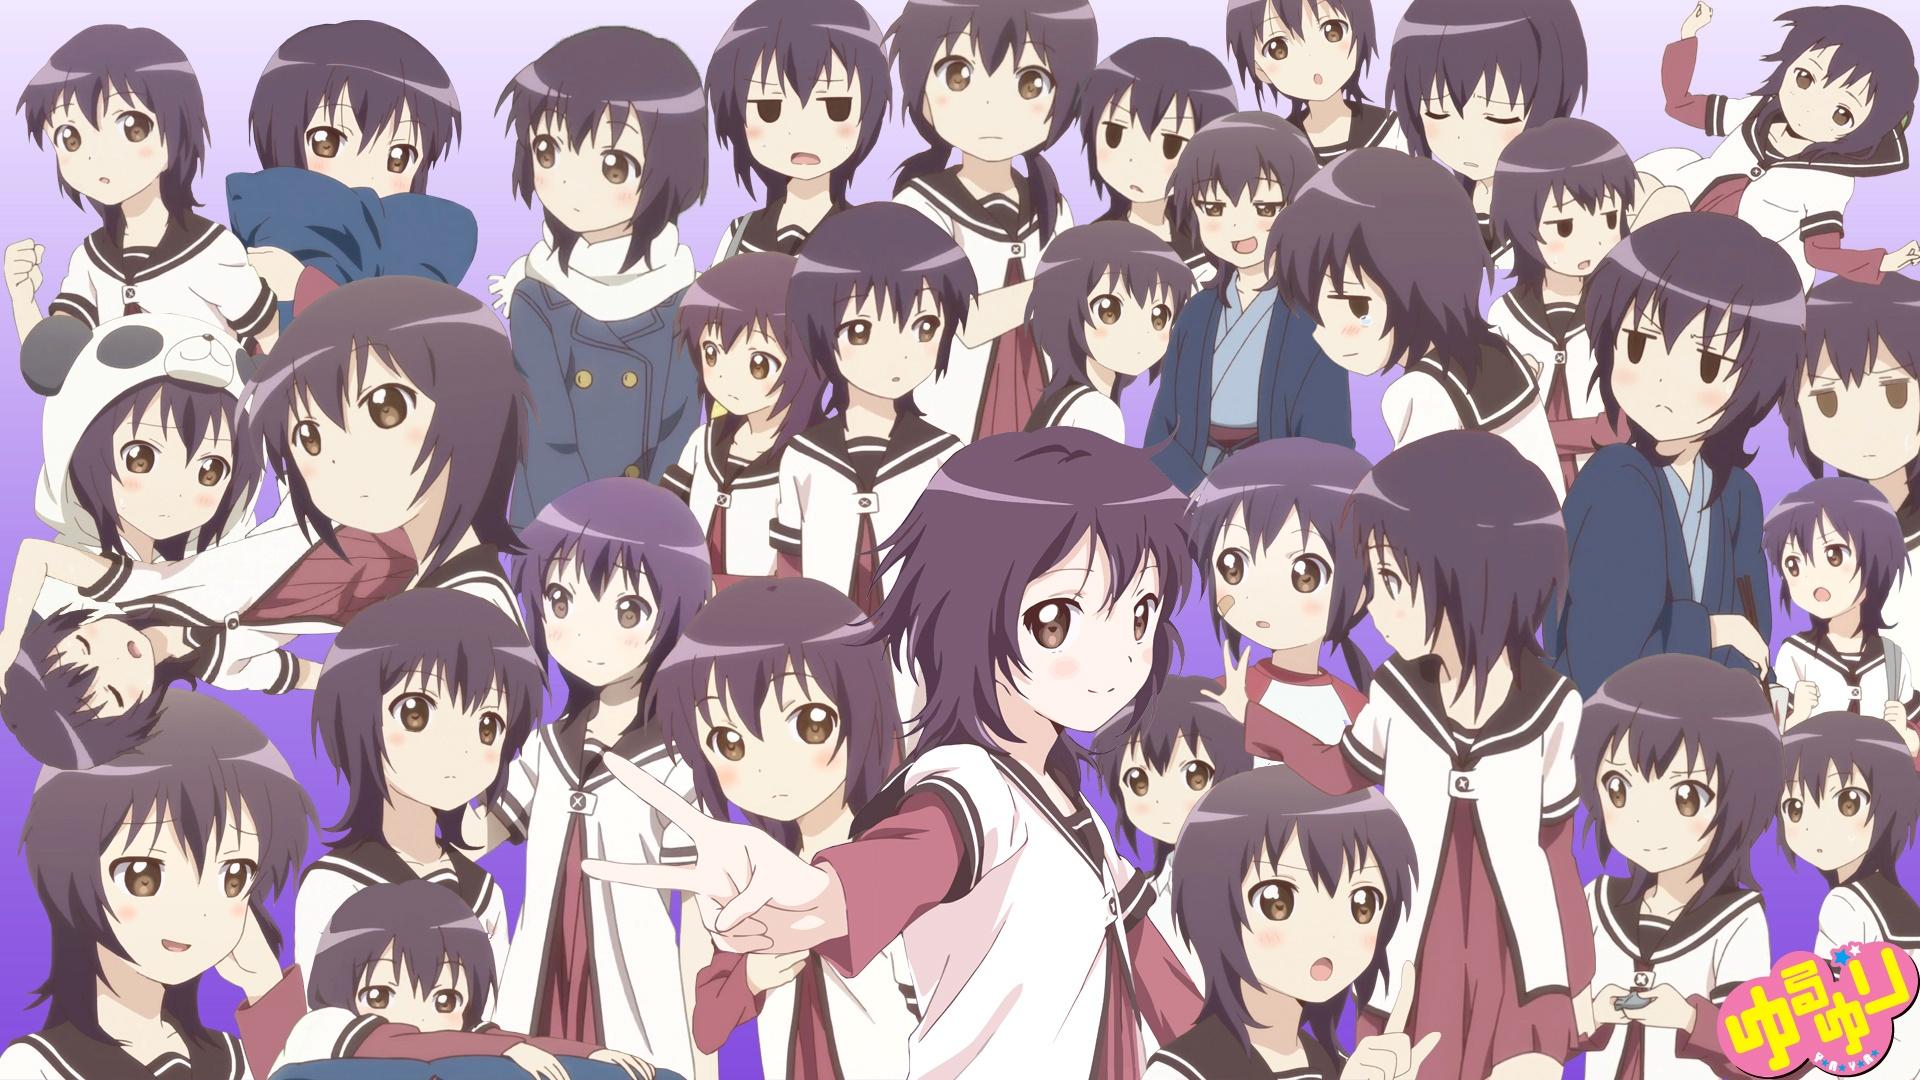 HQ Yuru Yuri Wallpapers | File 680.03Kb